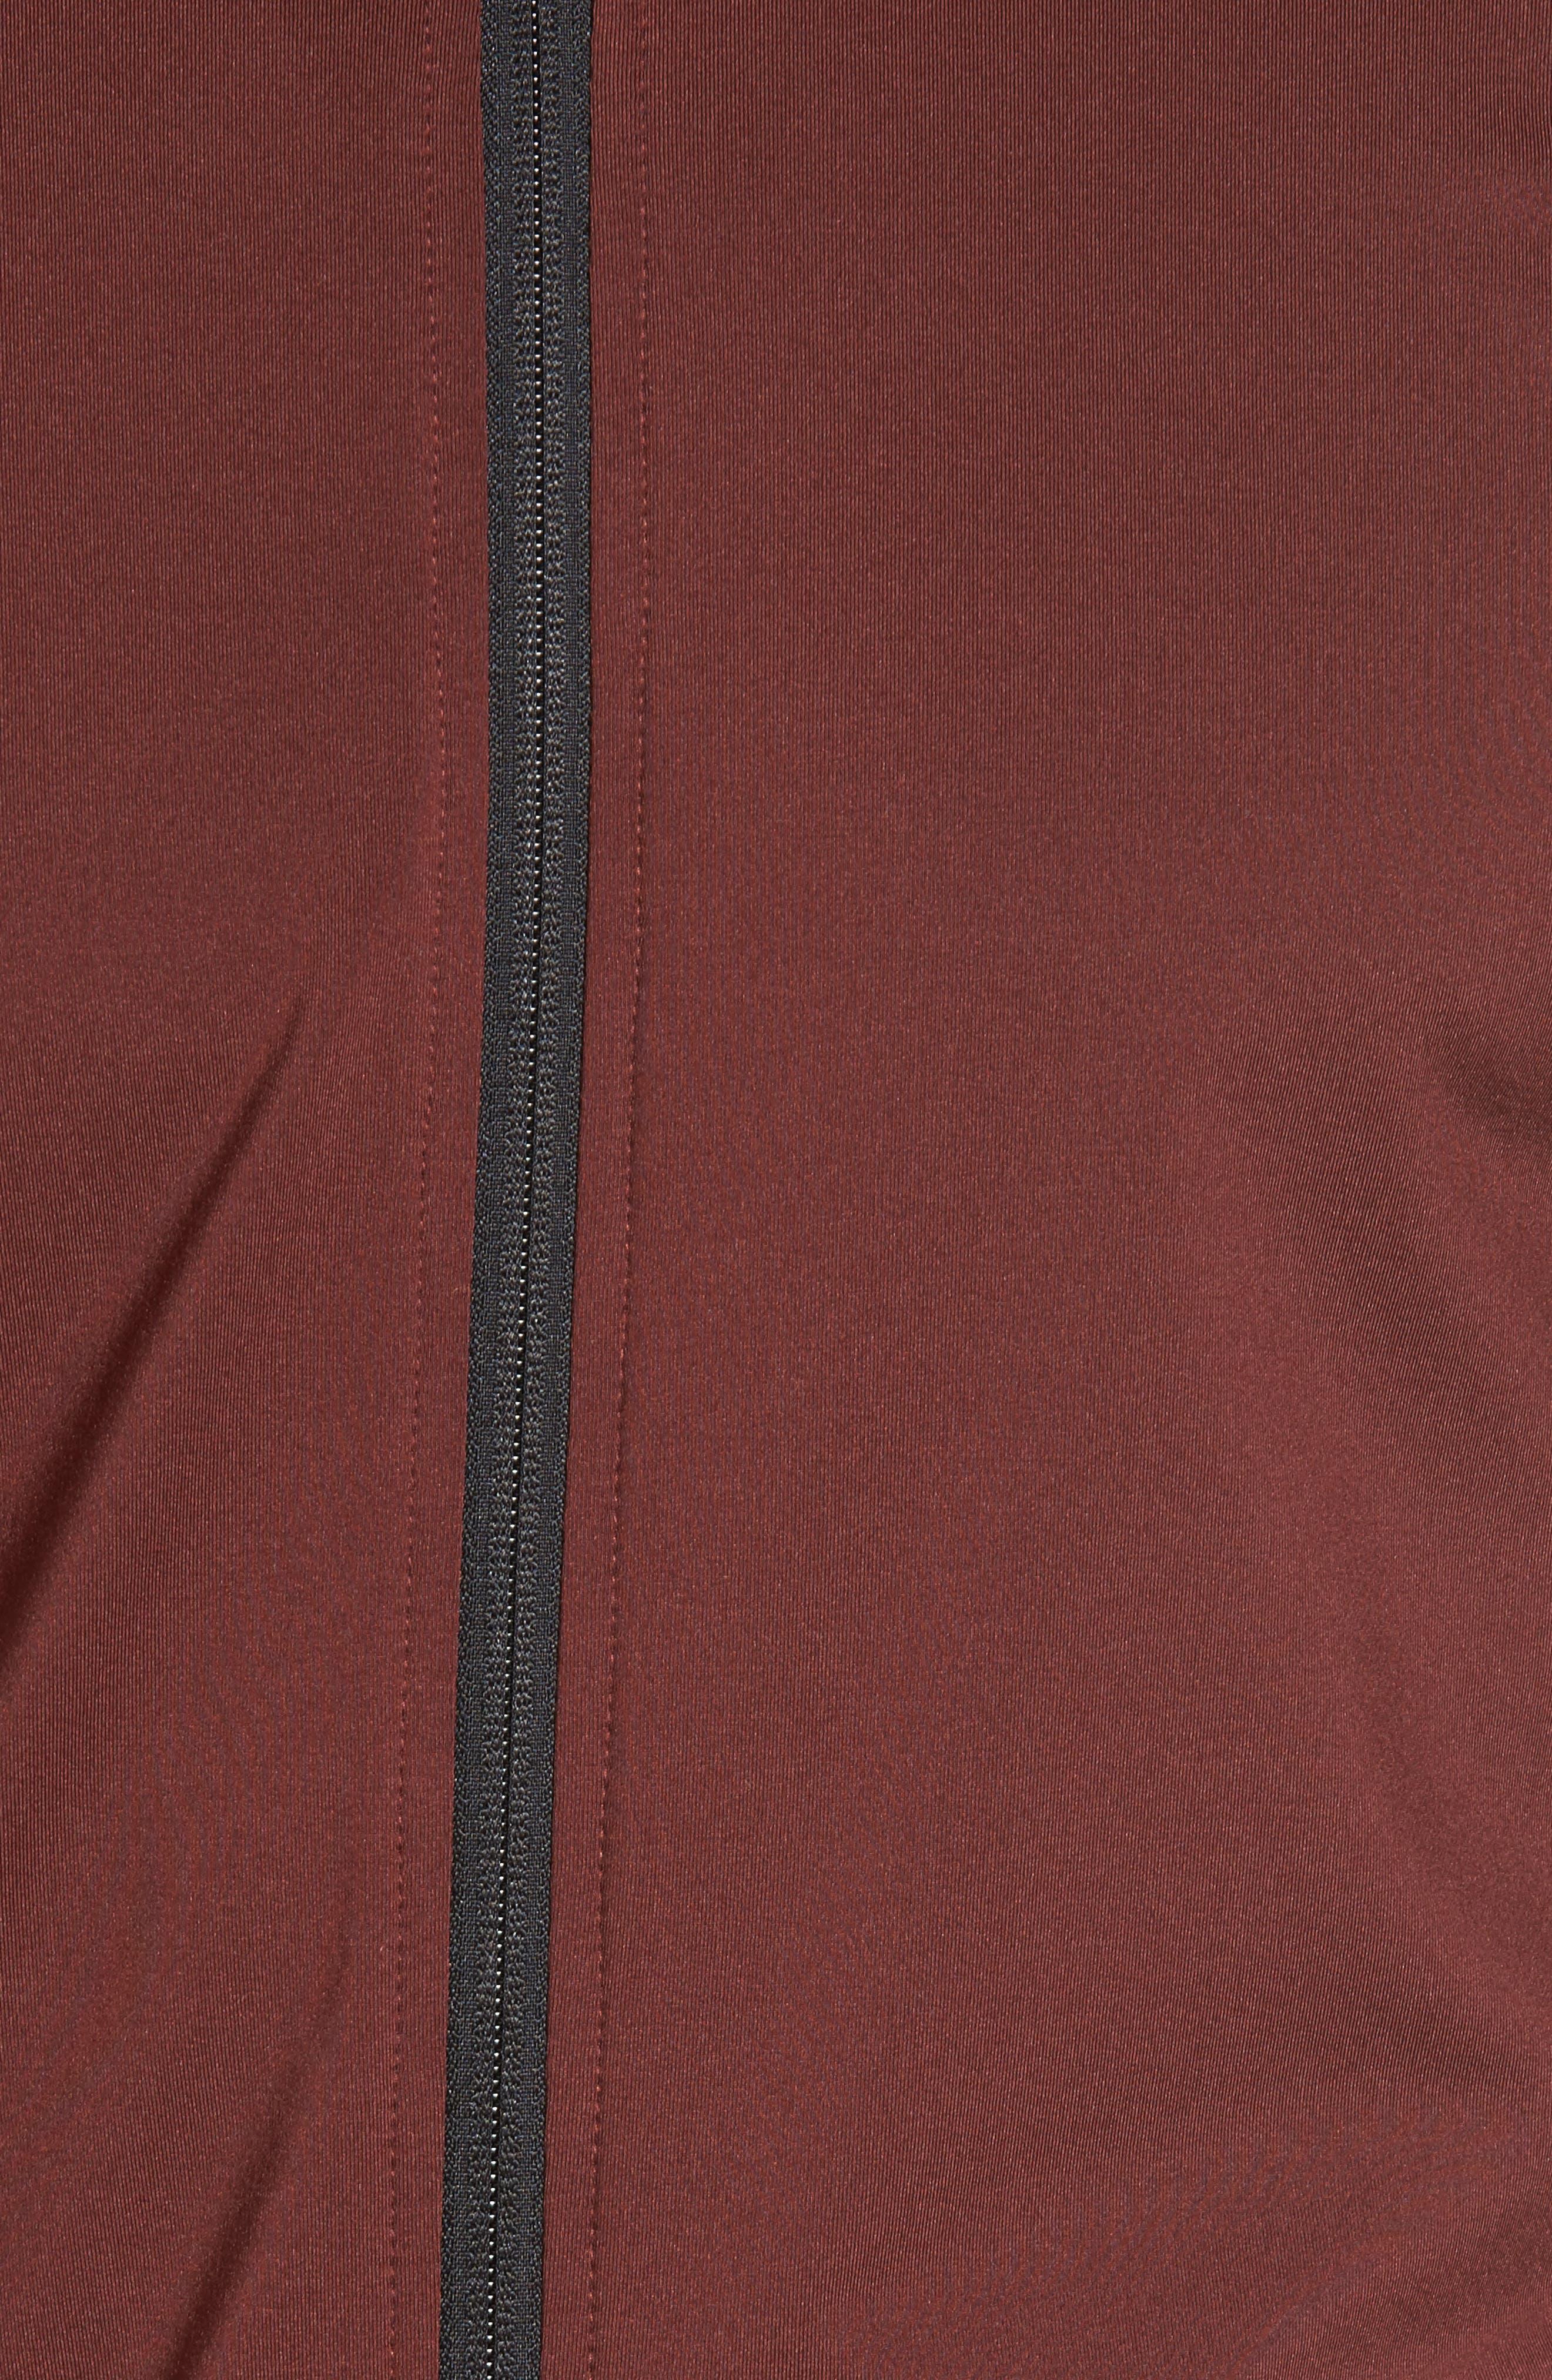 Hexawarm Track Jacket,                             Alternate thumbnail 17, color,